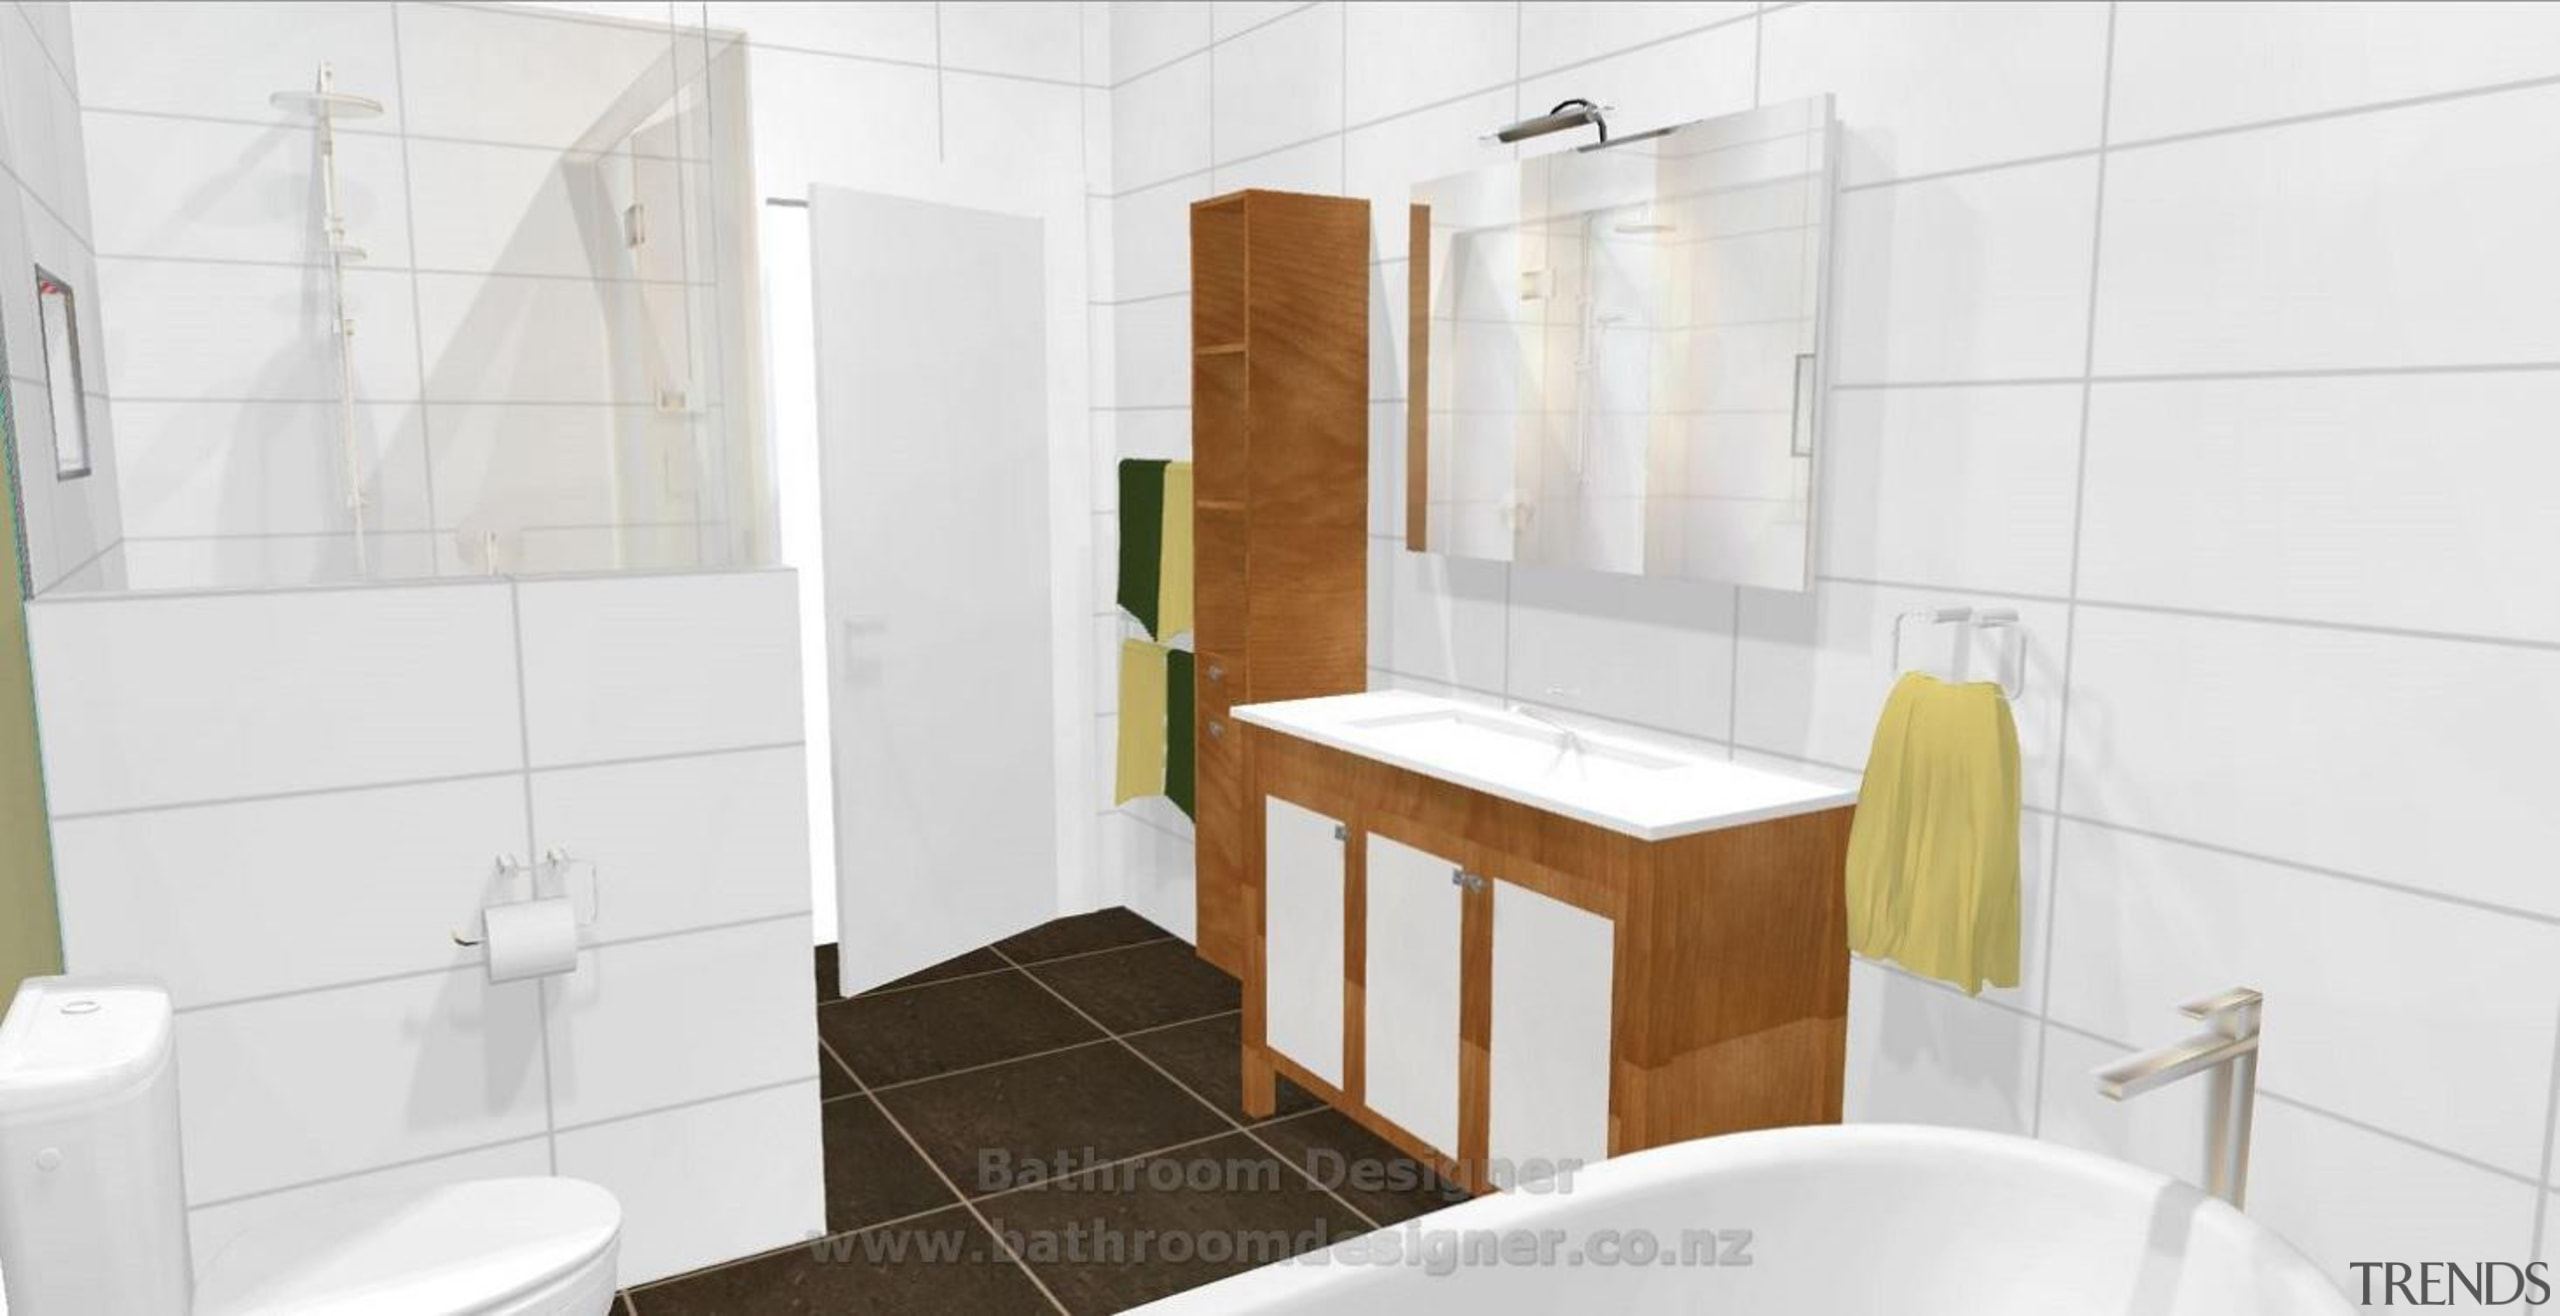 Bathroom Designer. This 3D image of proposed bathroom bathroom, bathroom accessory, bathroom cabinet, floor, home, interior design, property, room, tile, white